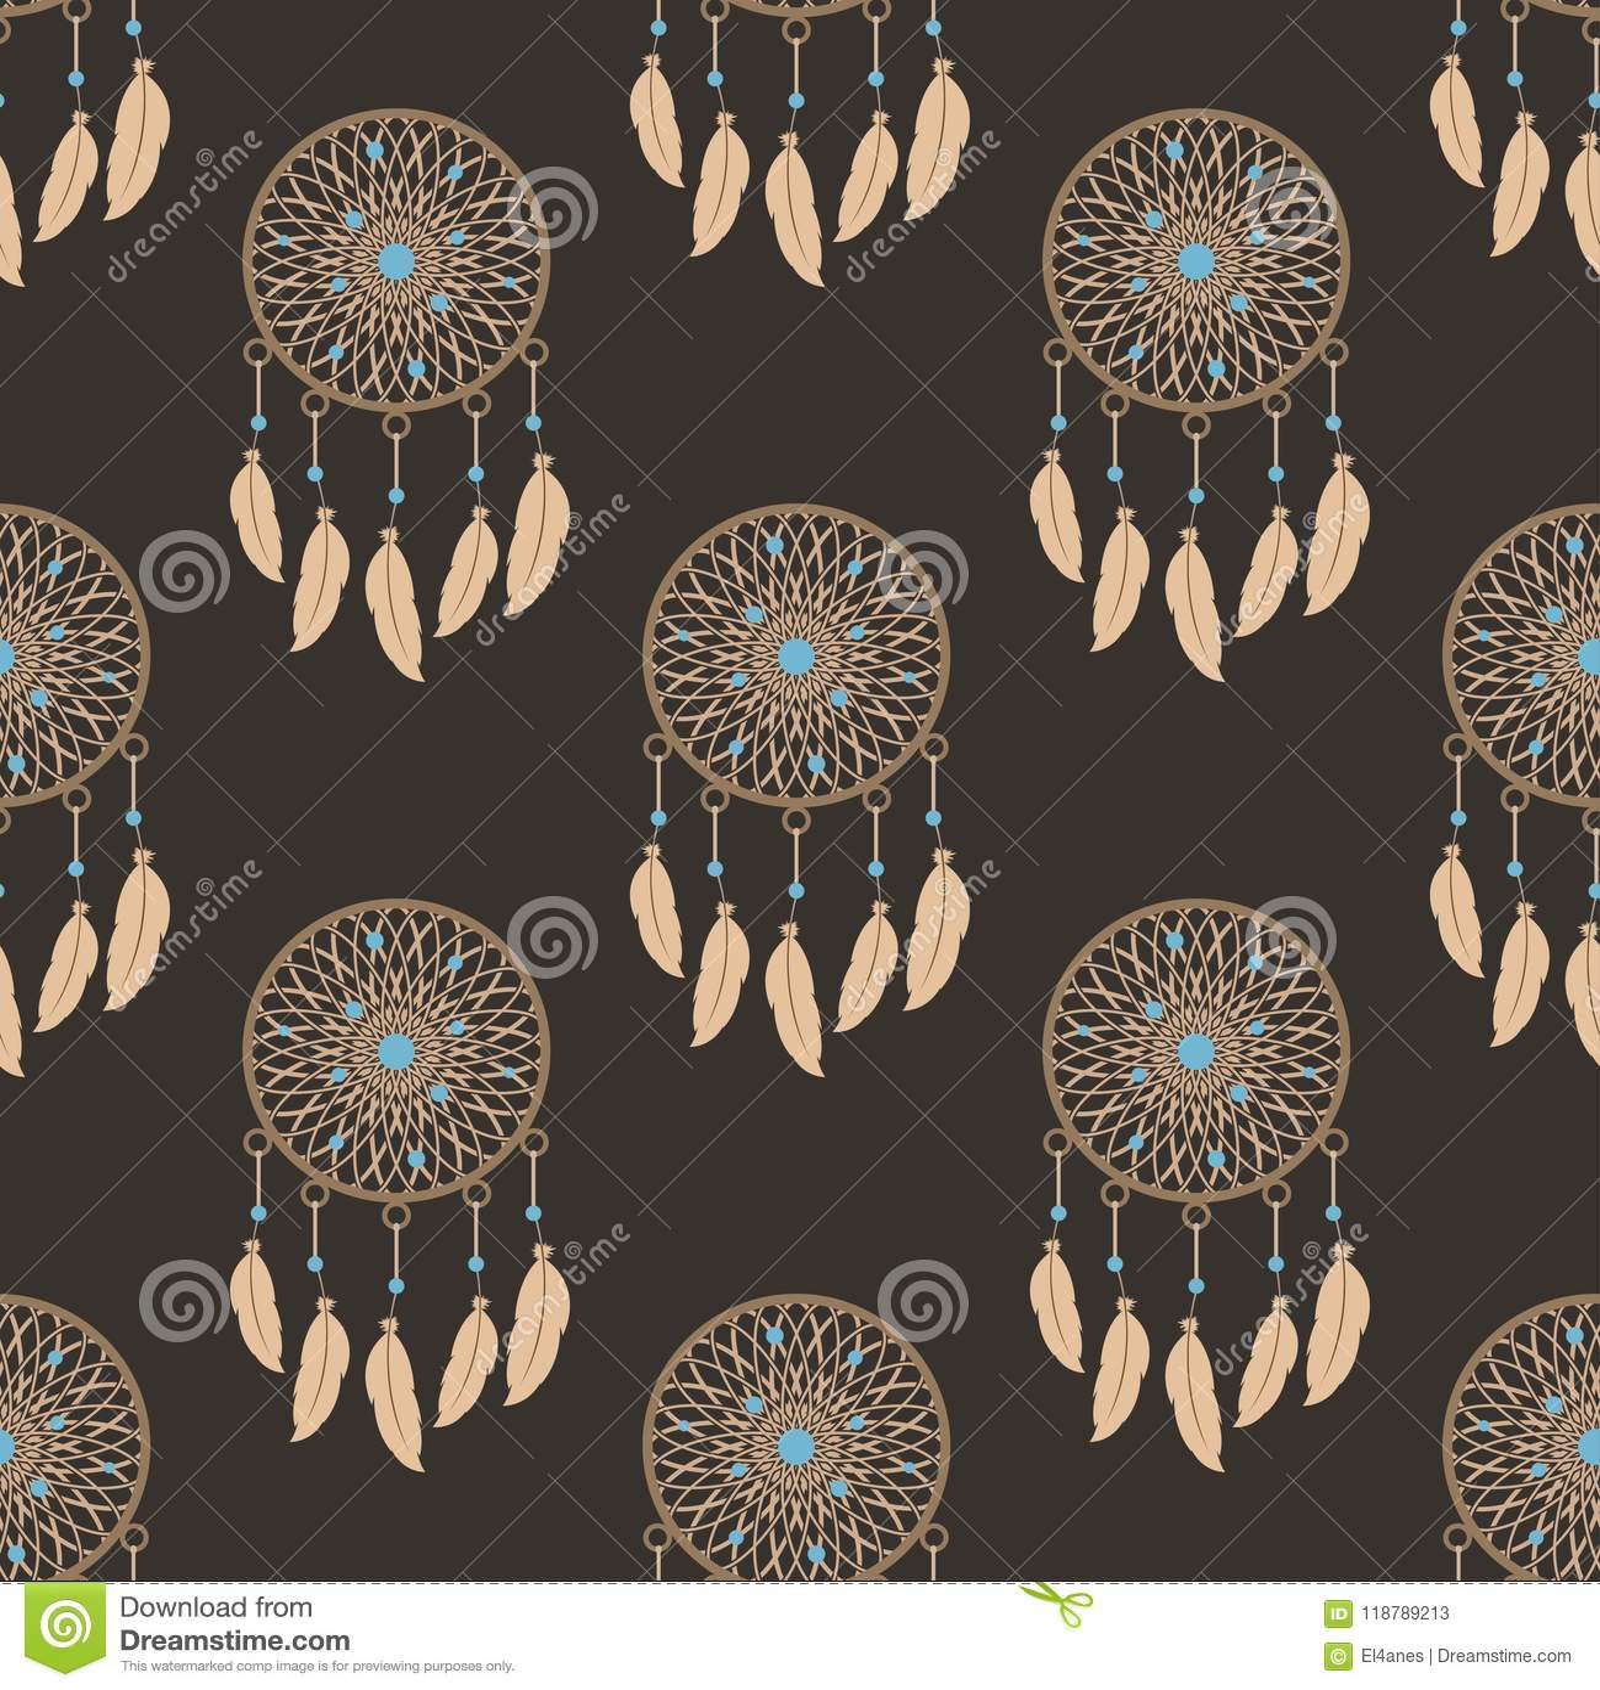 Dream catcher wallpaper. Ethnic style. Seamless vector pattern